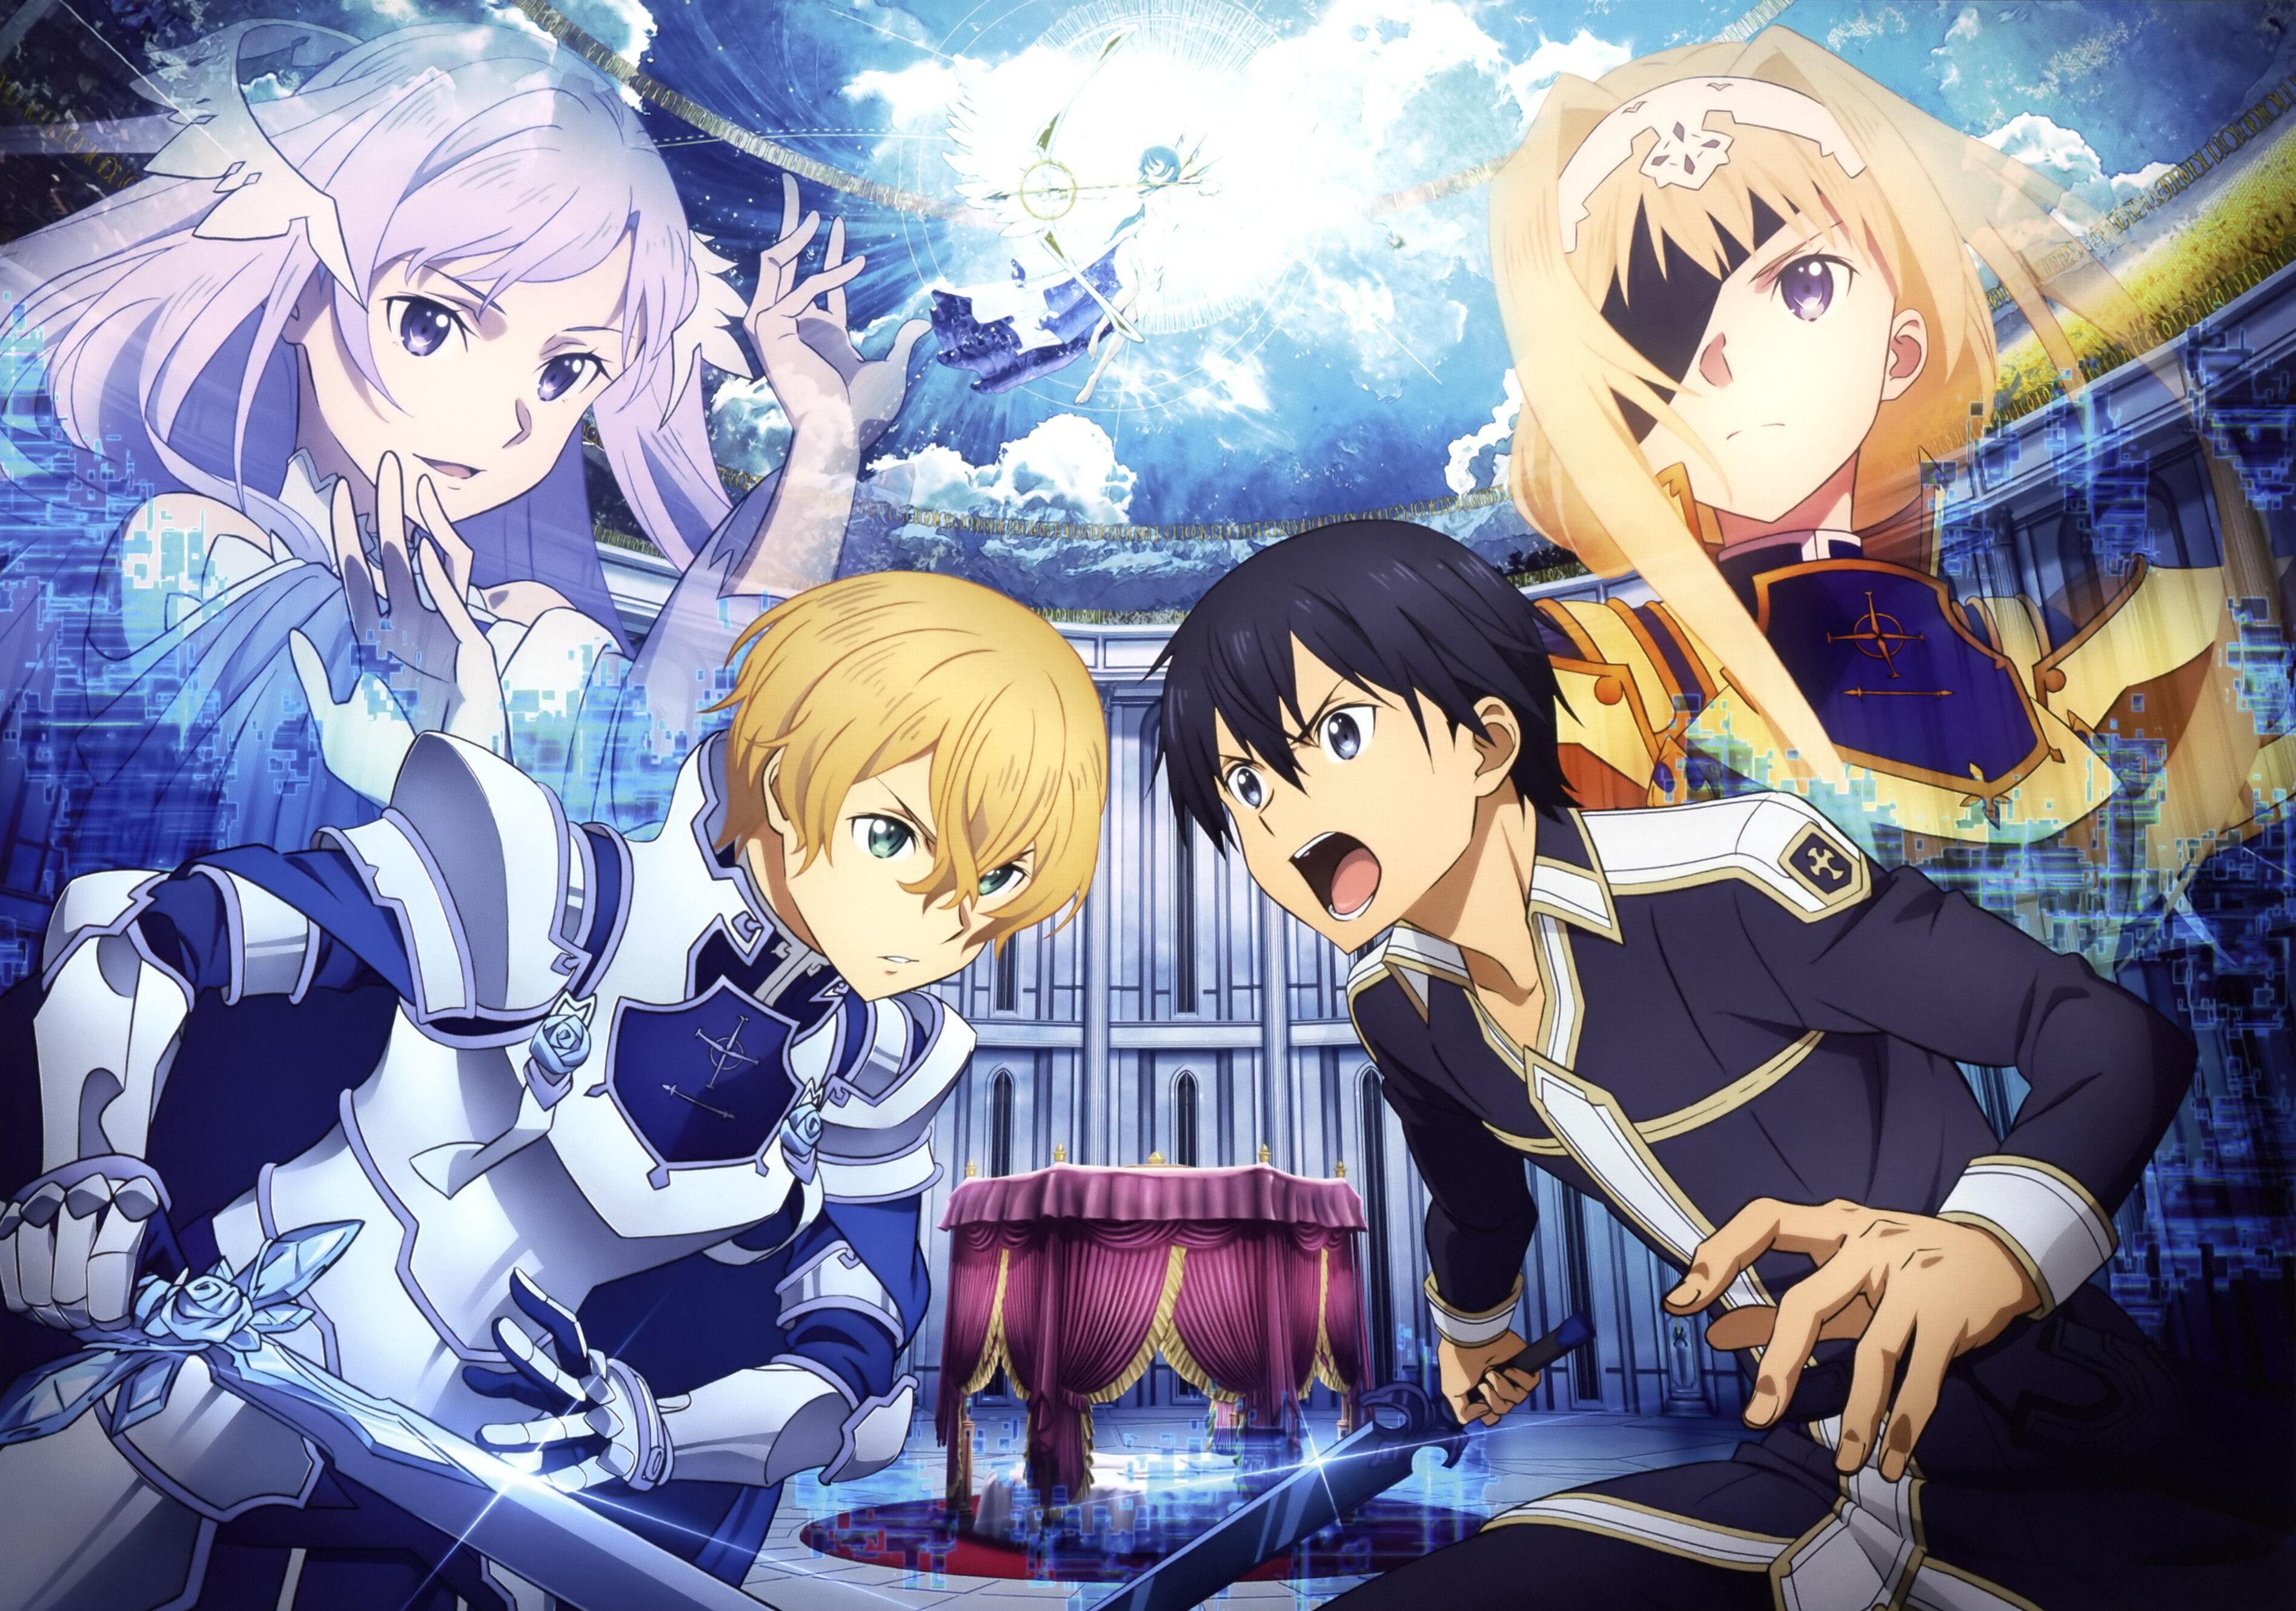 Sword Art Online Alicization Hd Wallpaper Background Image